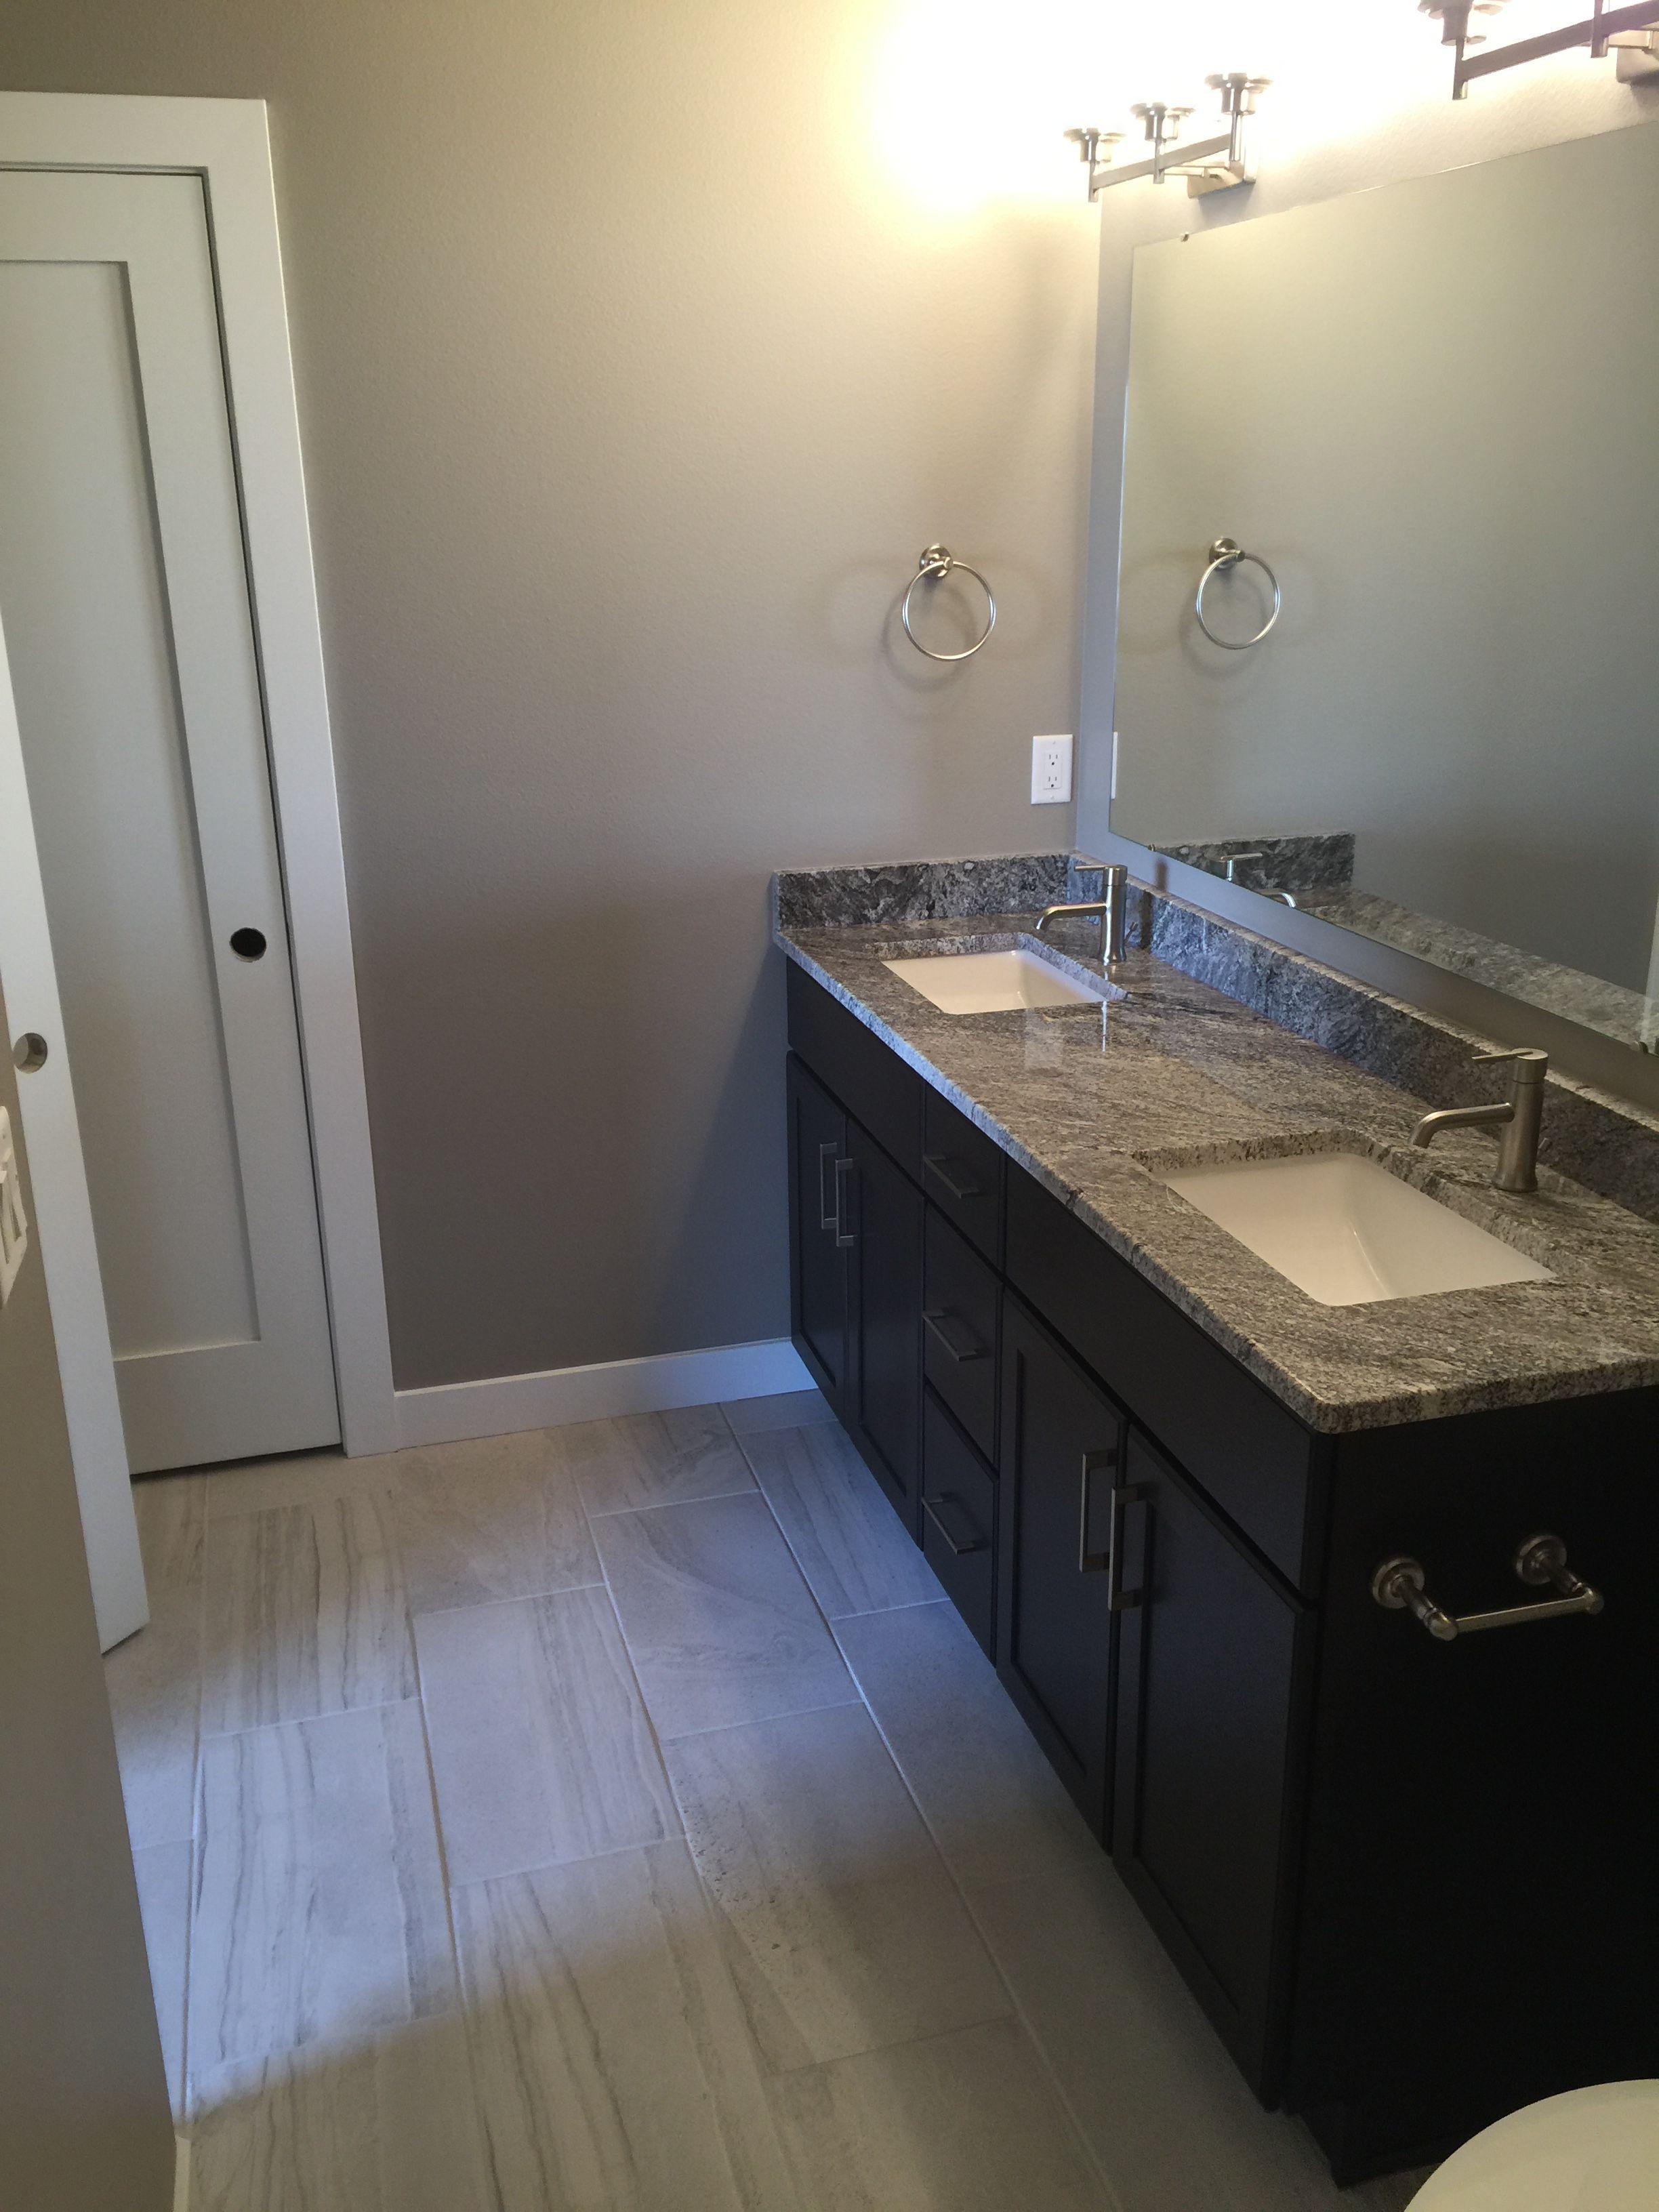 Flooring In 12x24 Porcelain Tile Installed At A 1 3 Staggered Tile Installation Bathroom Mirror Framed Bathroom Mirror